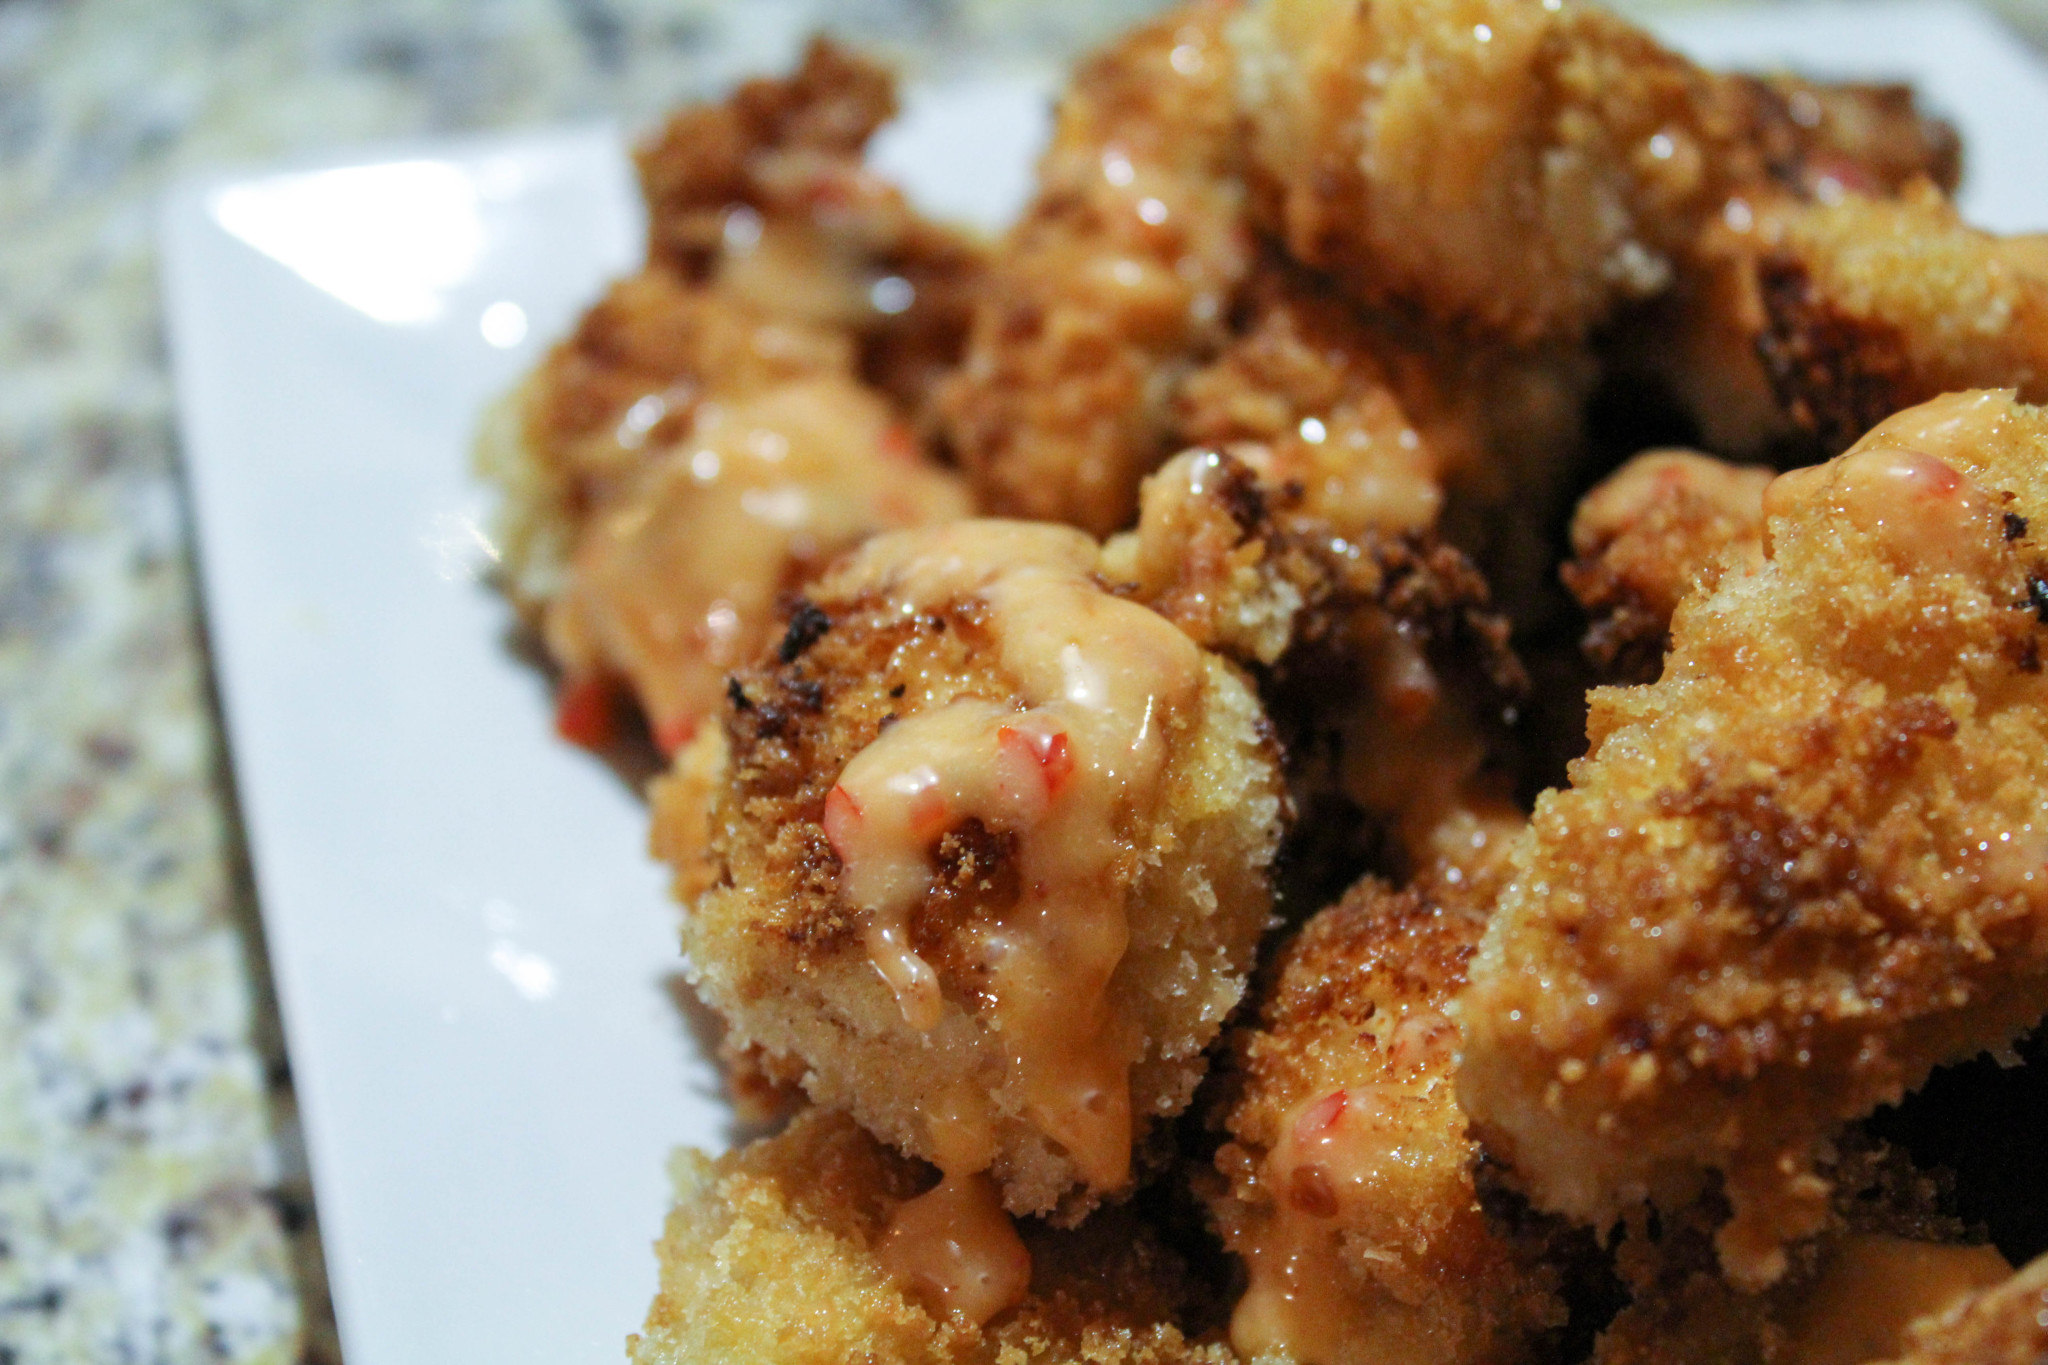 Bang Bang Chicken – Copycat Recipe from The Cheesecake Factory